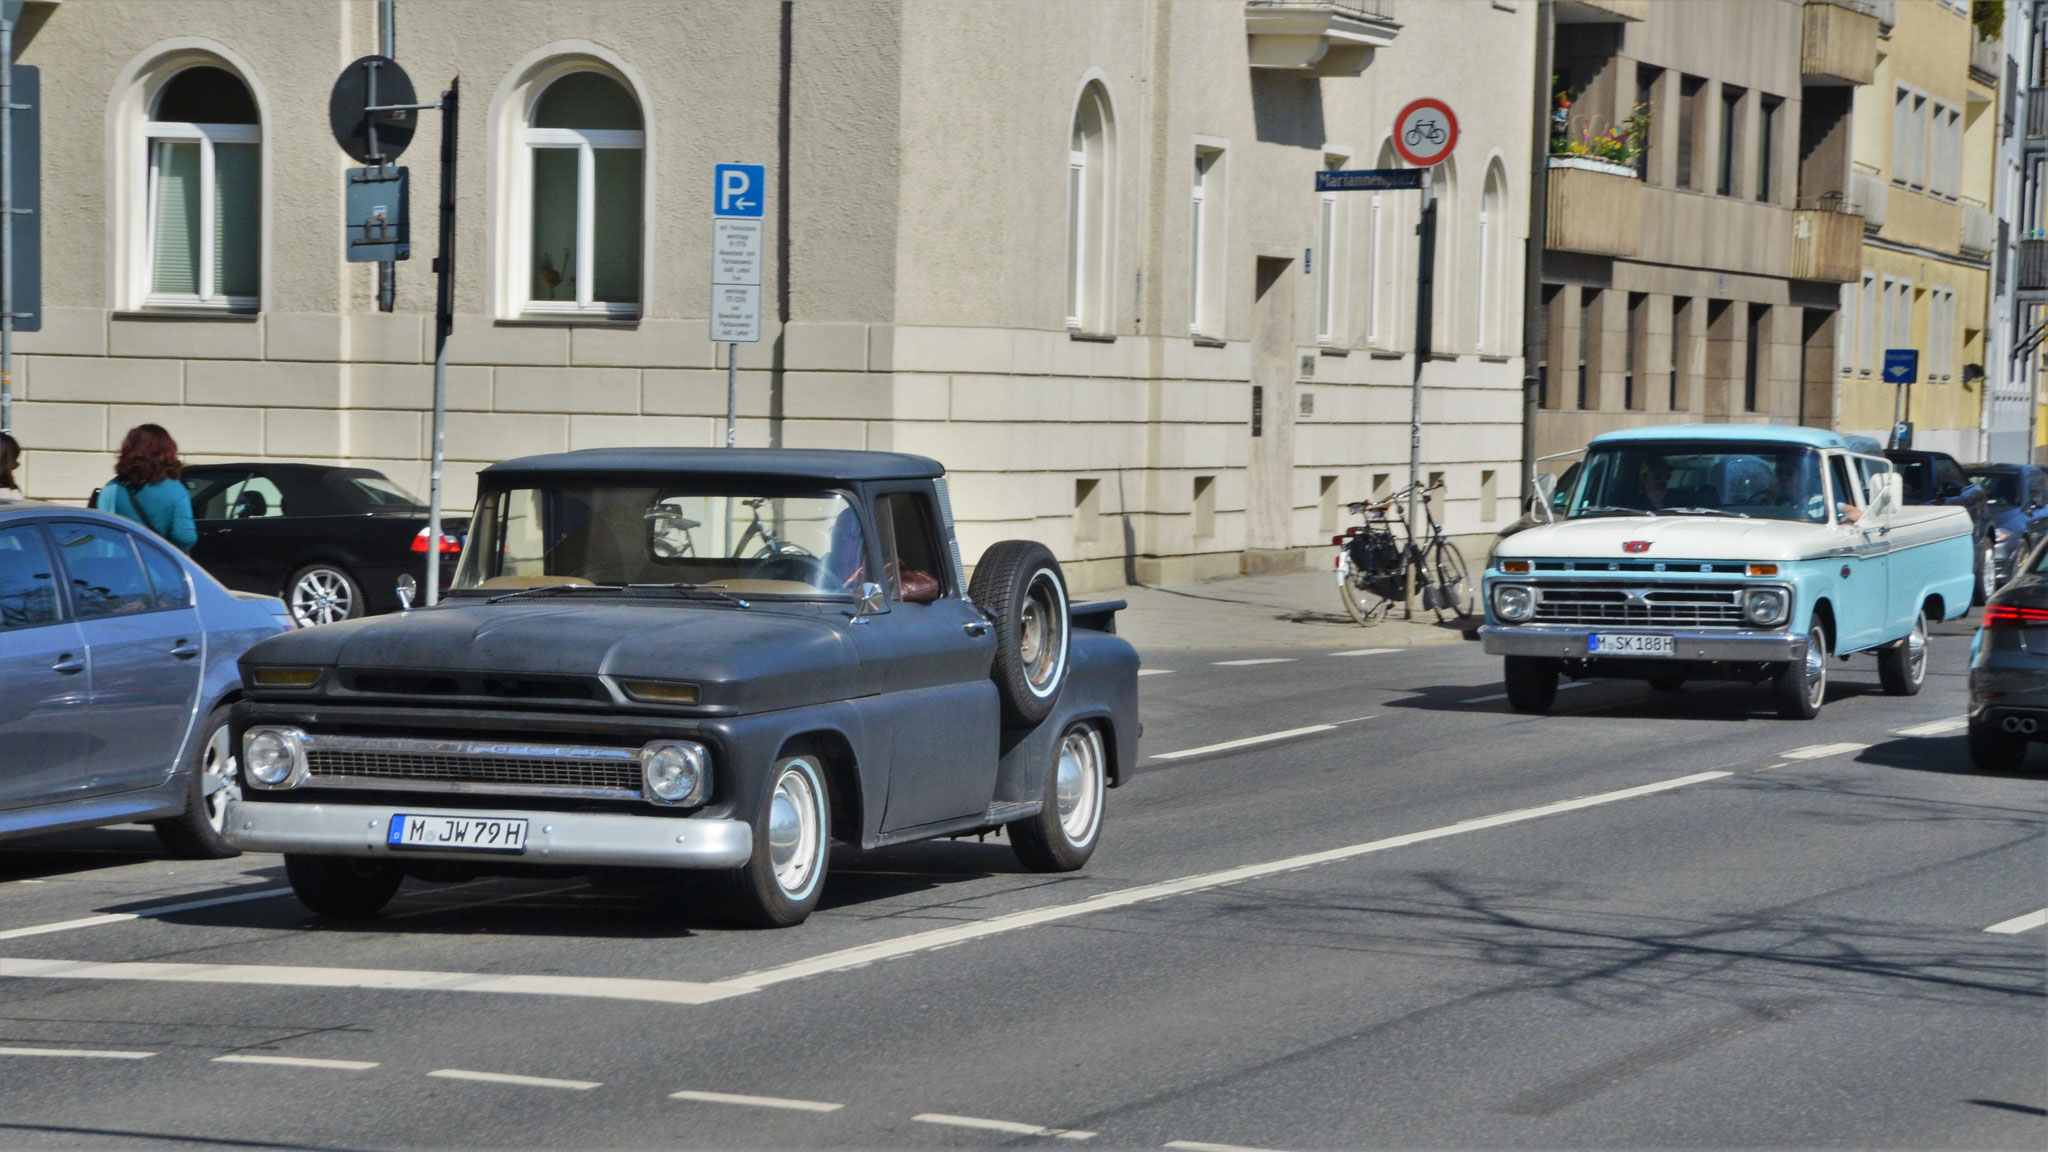 Chevrolet Pickup - M-JW-79H